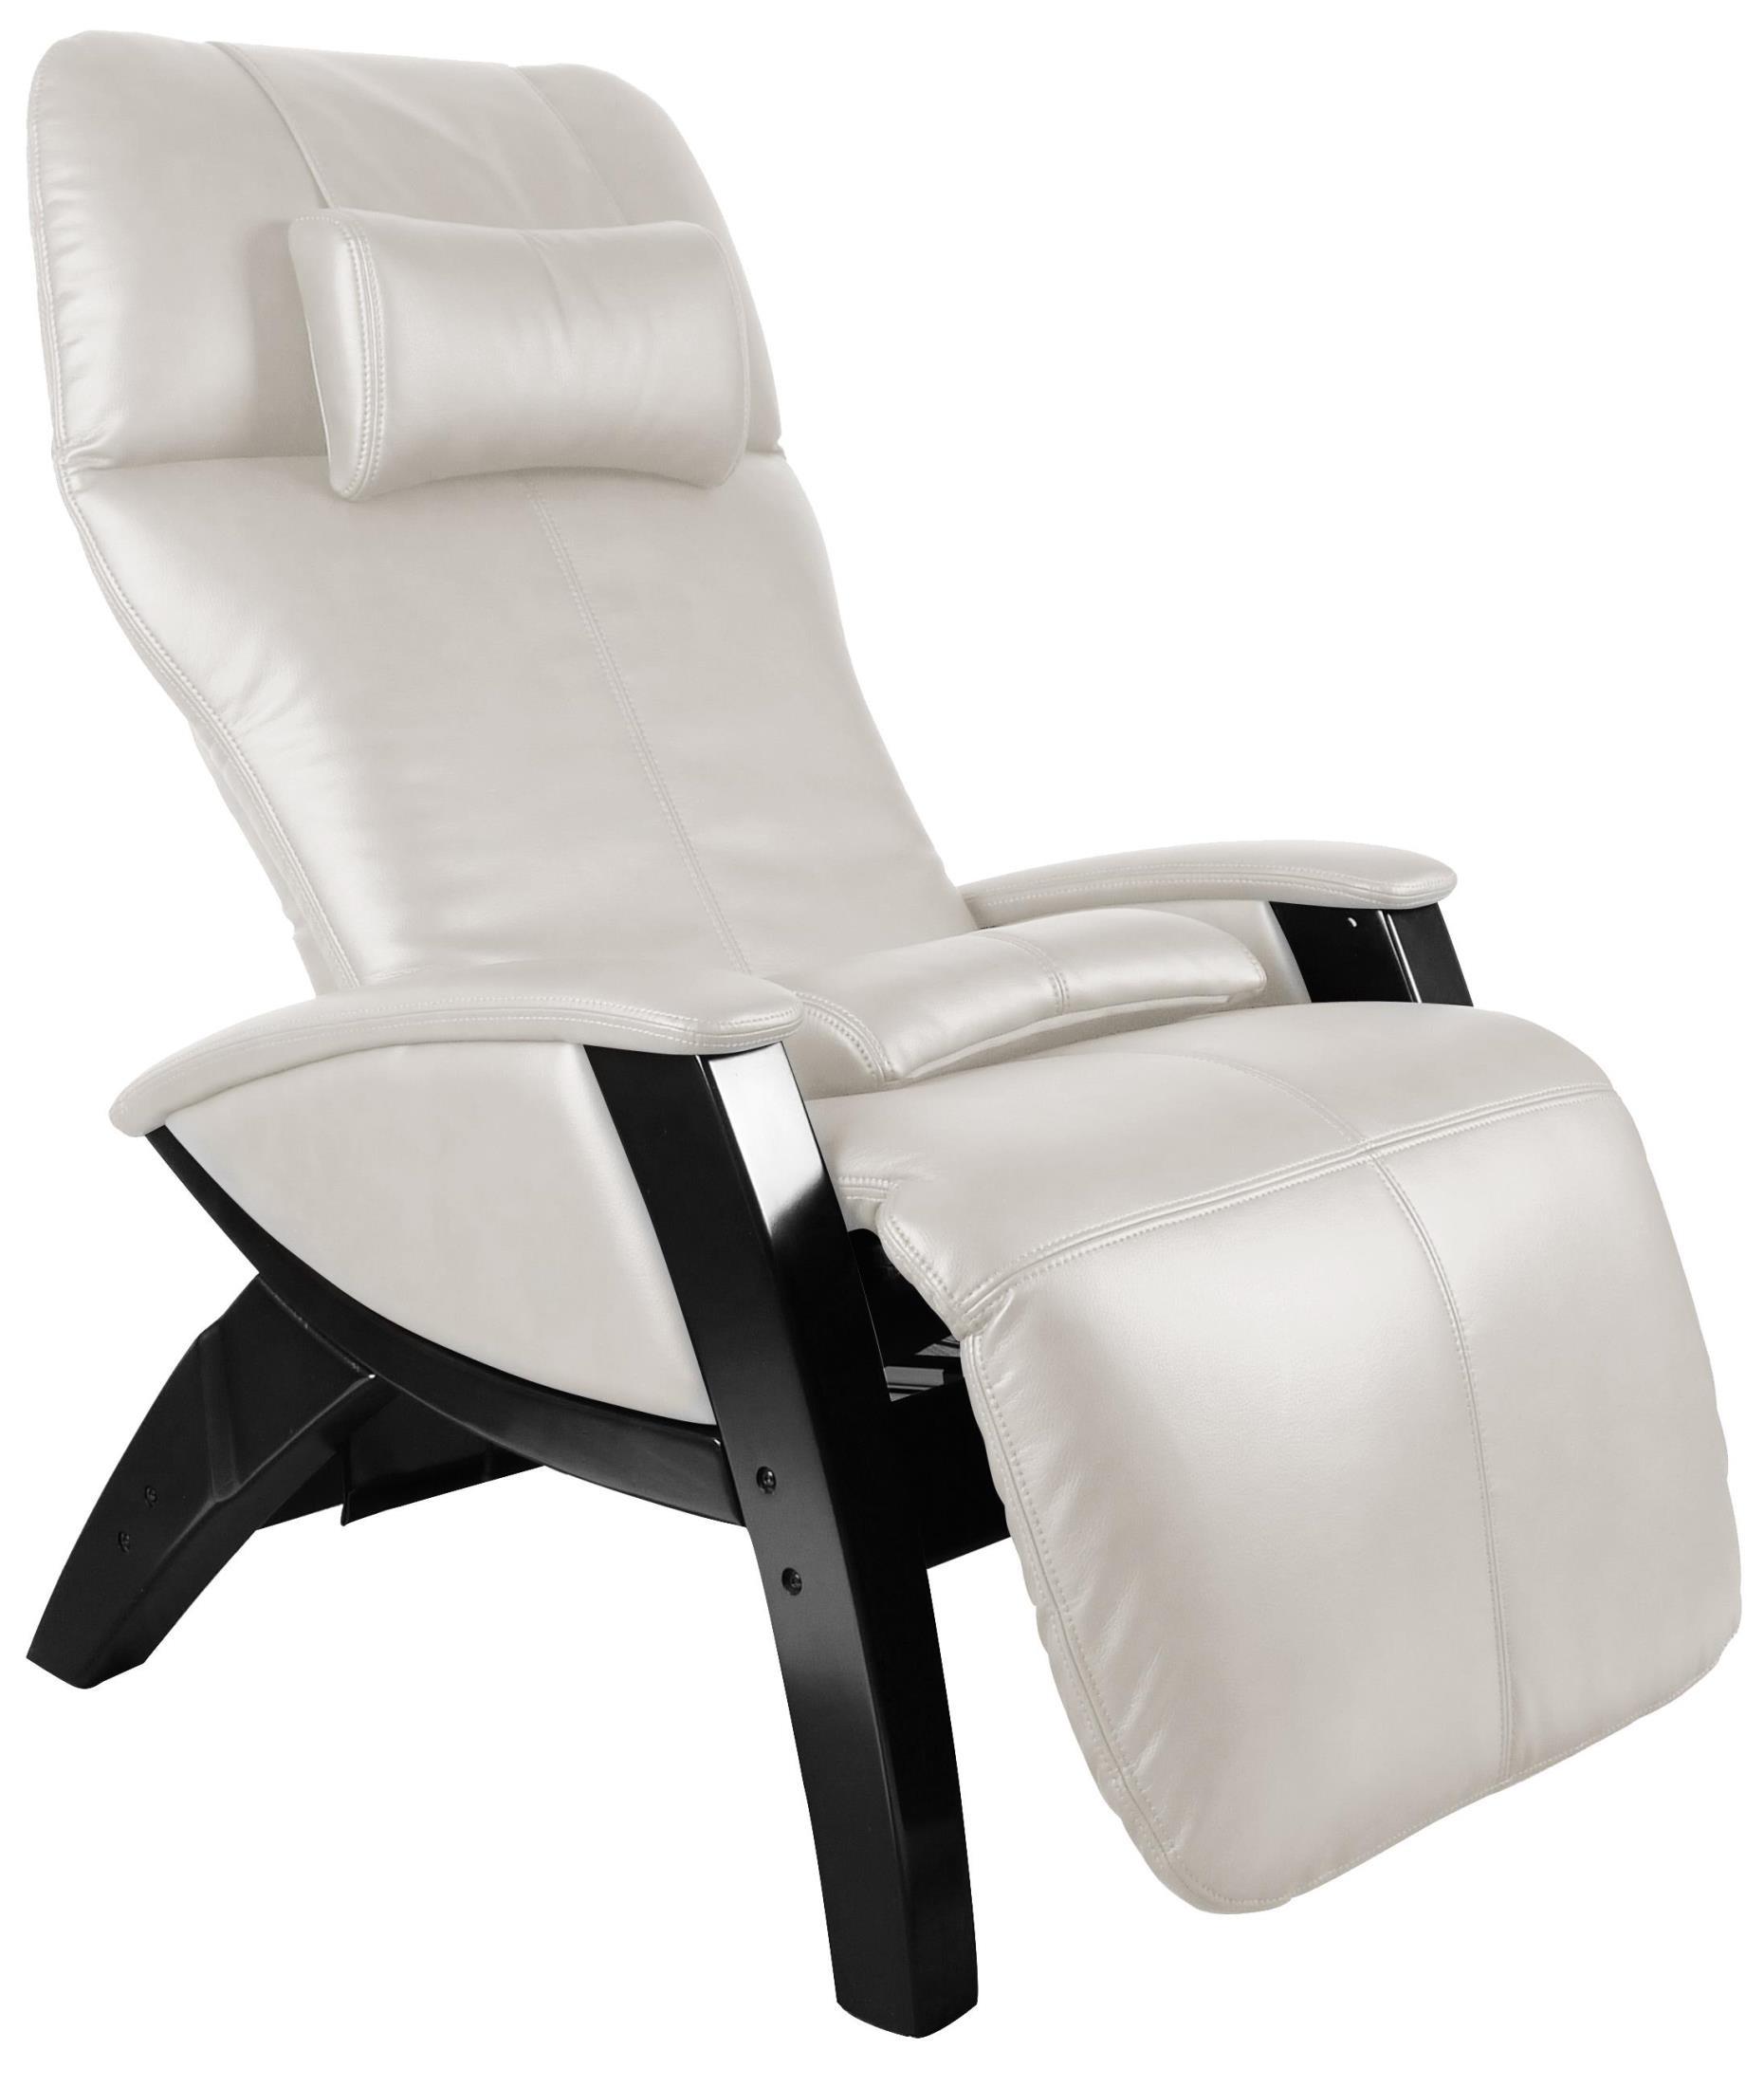 Svago ZG Ivory Chair from Svago SV401 30 BL